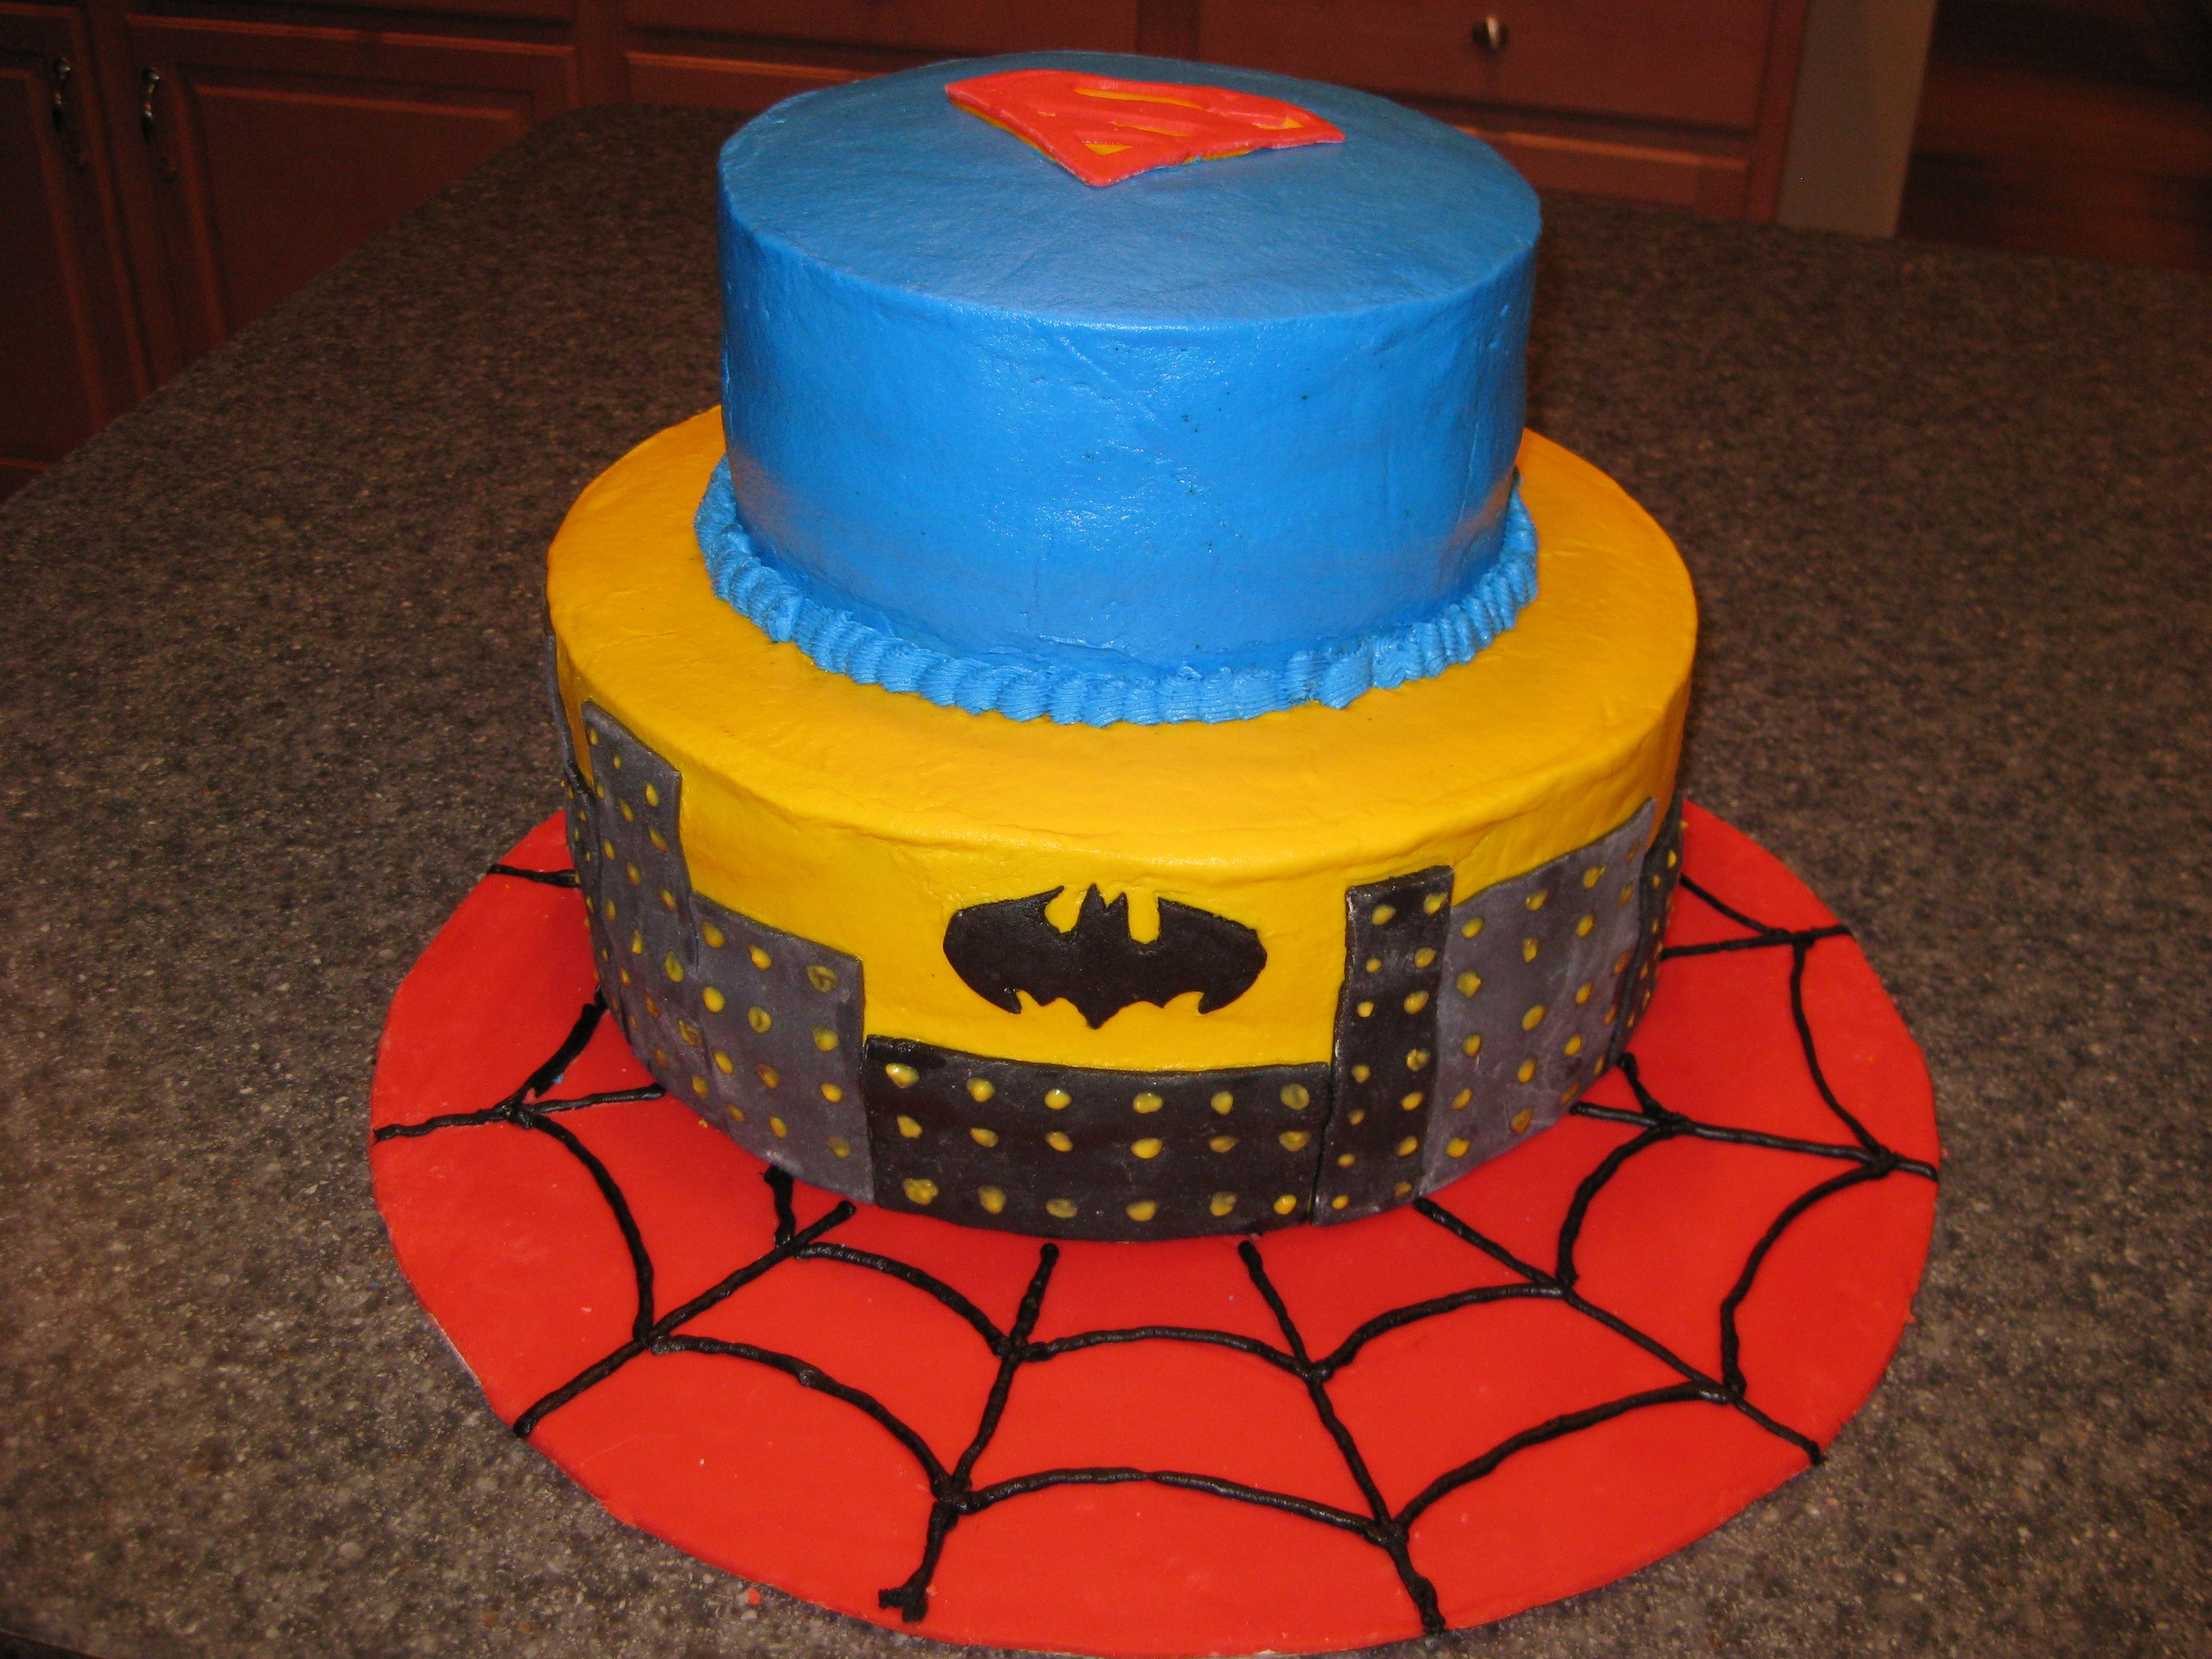 Bottomlayer Partay Superhero Birthday Cake Jpg 3264x2448 Walmart Super Heroes